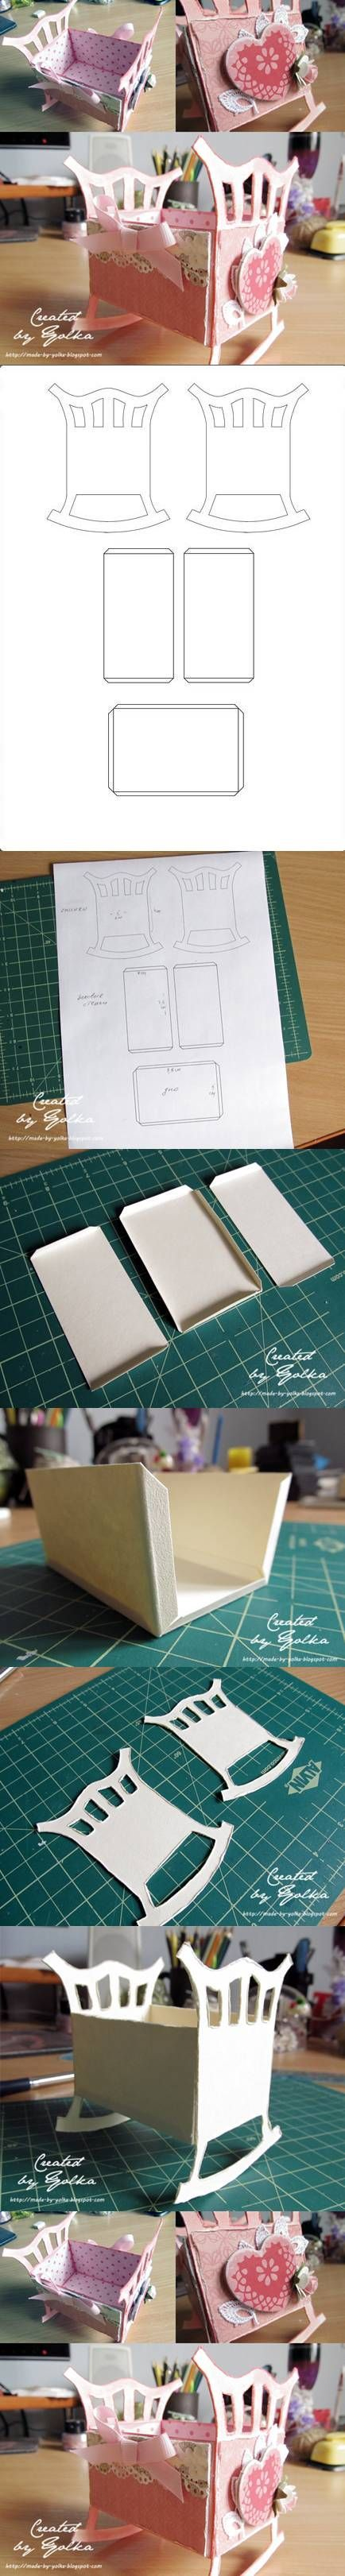 DIY Paper Crib DIY Projects